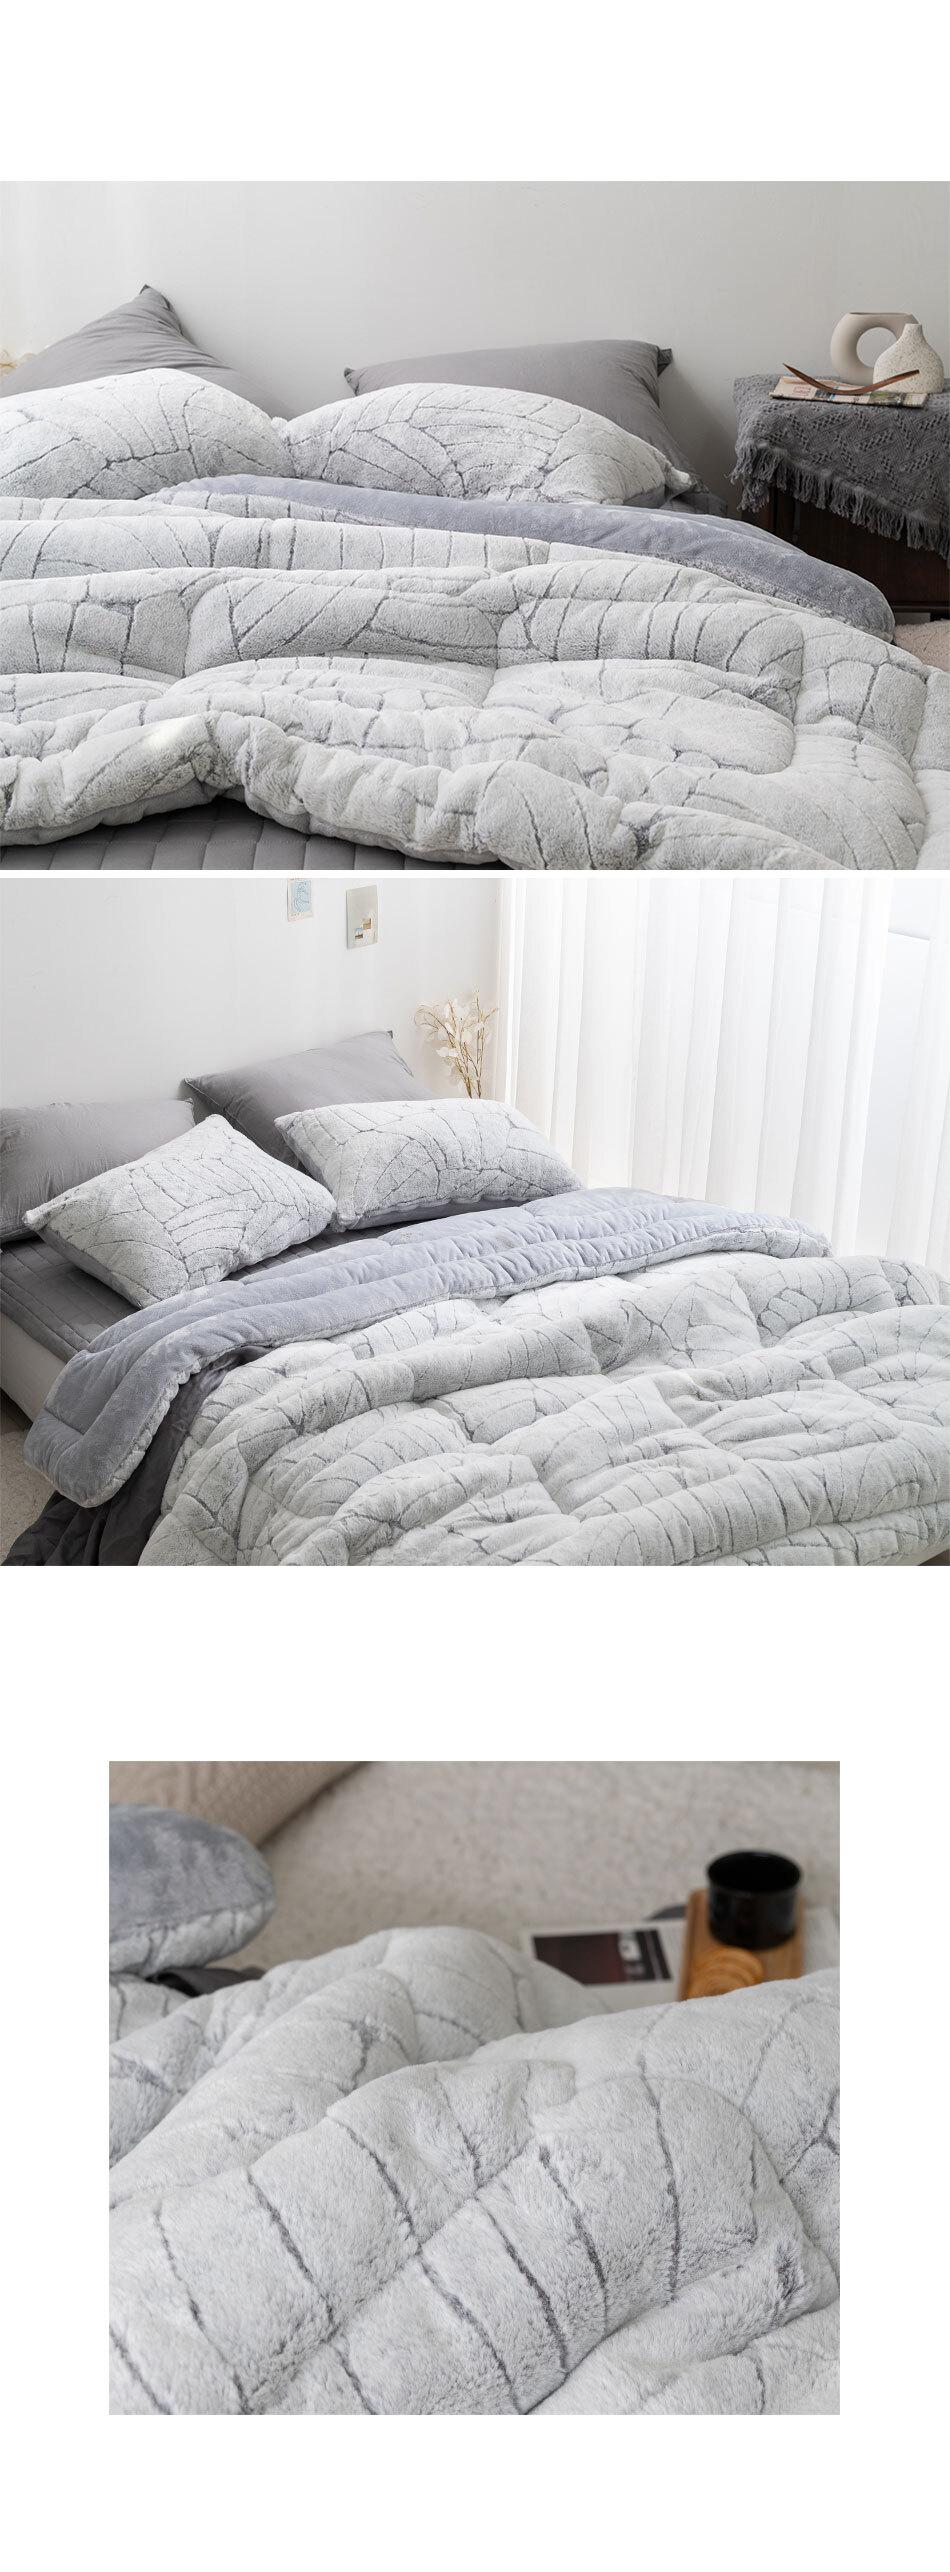 maple_bed_gray_01.jpg